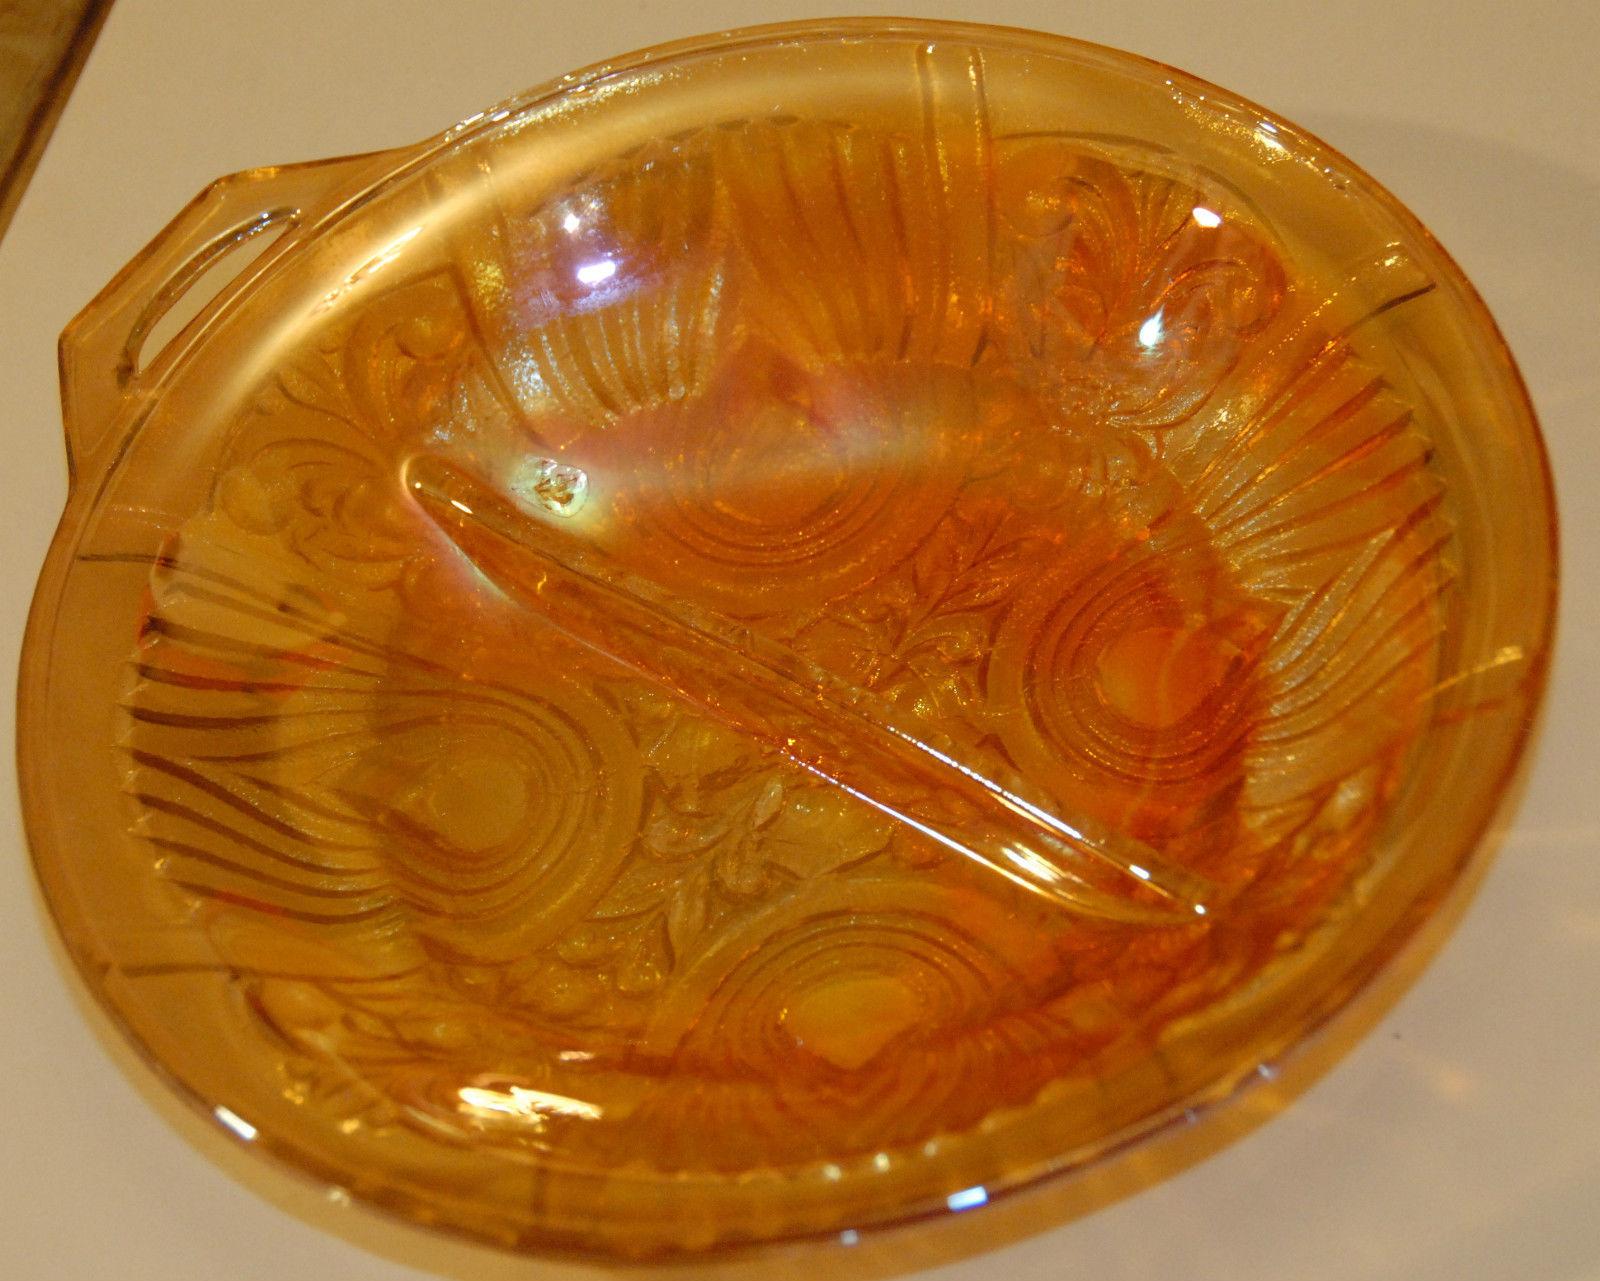 "KILLNARNEY 7 3/4"" MARIGOLD CARNIVAL IRIDESCENT ORANGE 2 PART RELISH DISH GLASS"